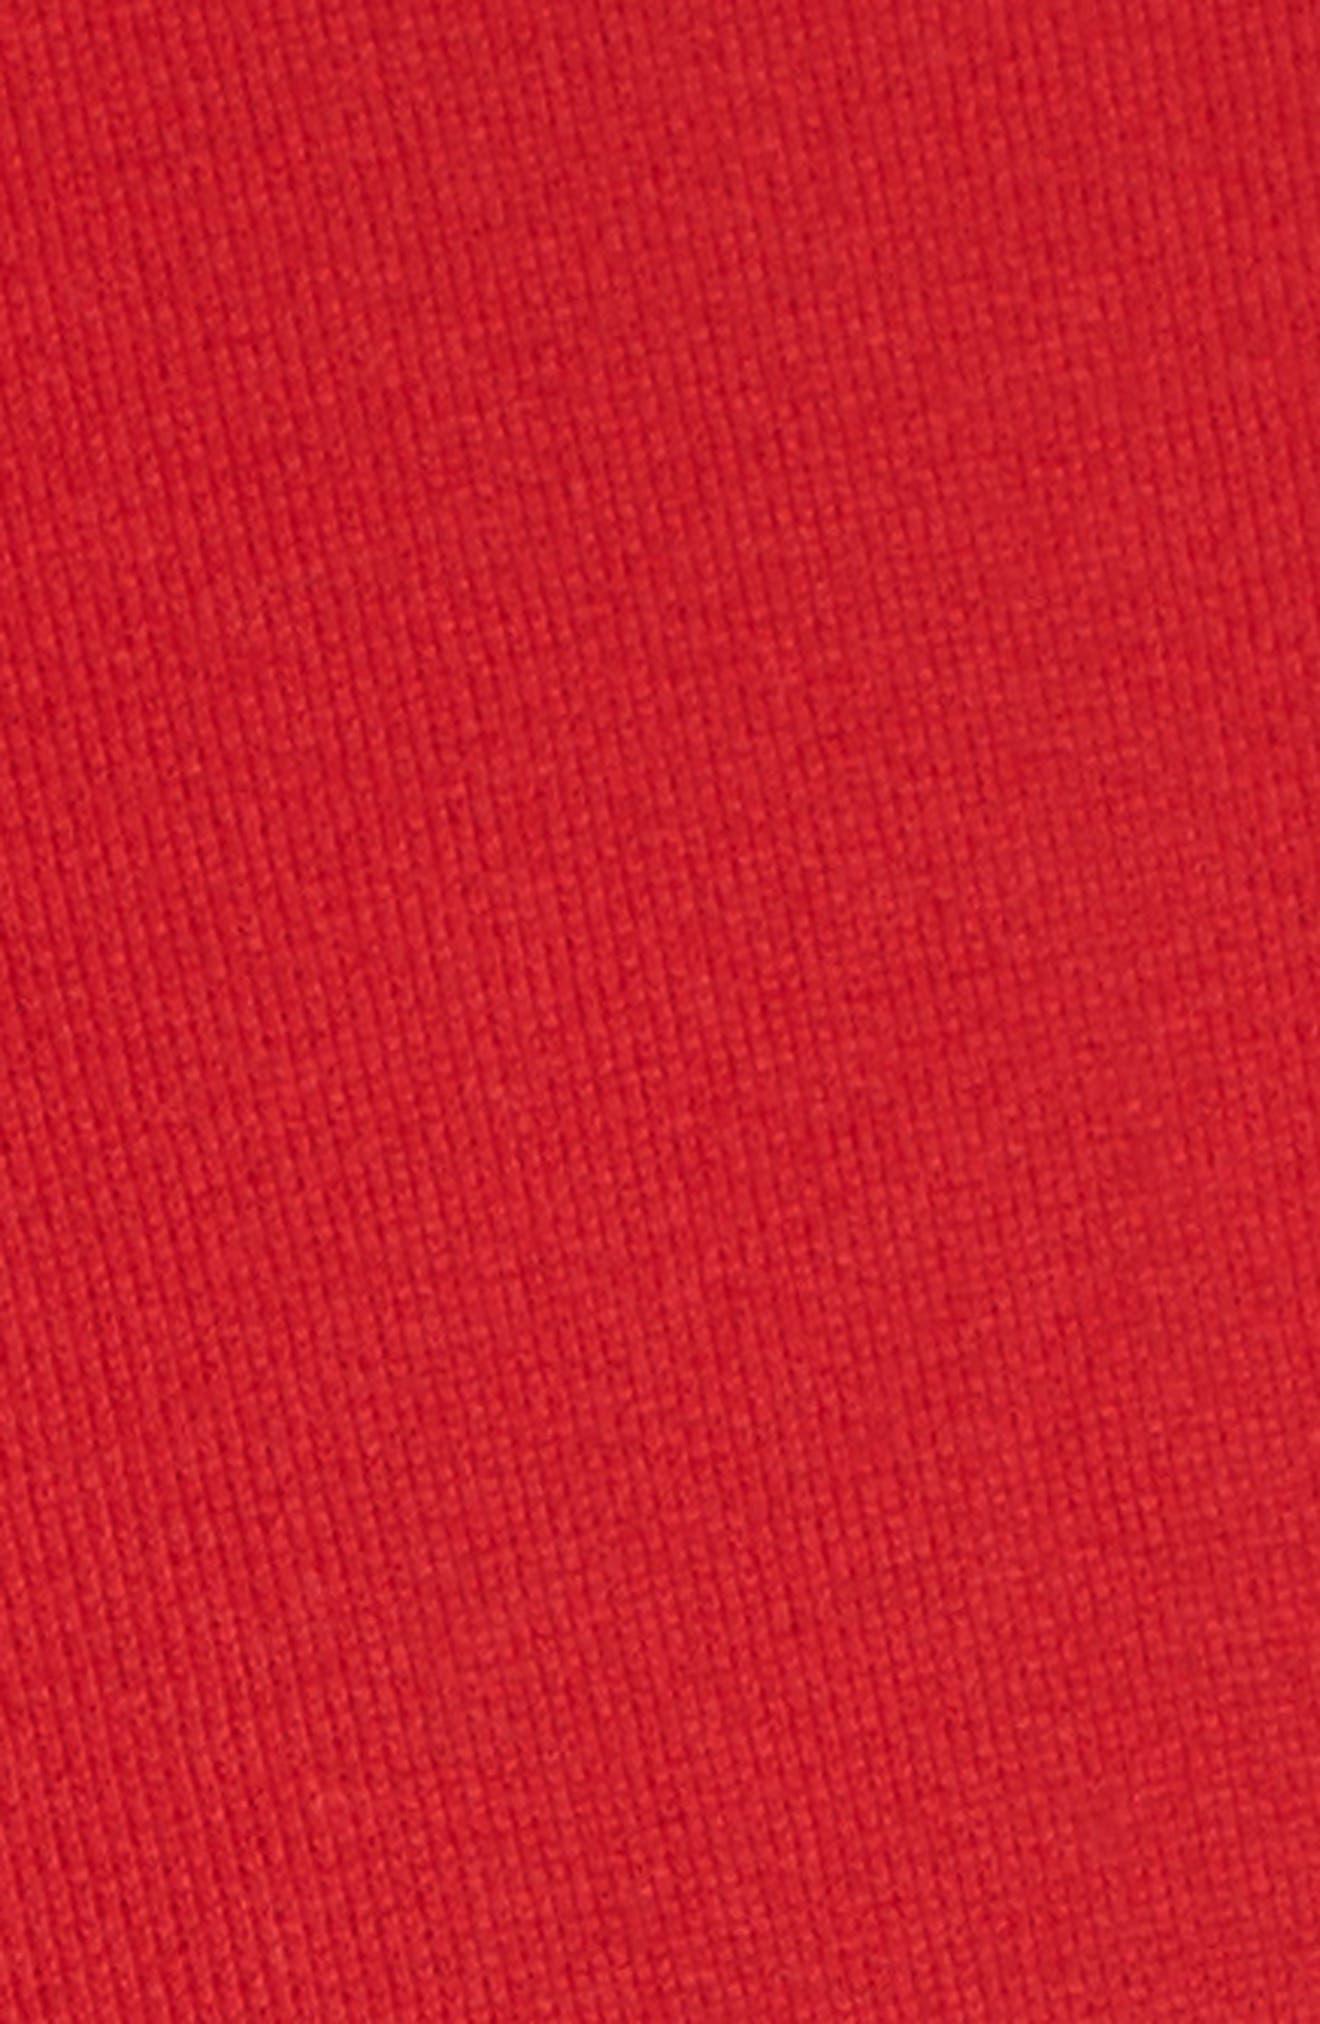 Let's Take an Elfie Sweatshirt,                             Alternate thumbnail 5, color,                             600